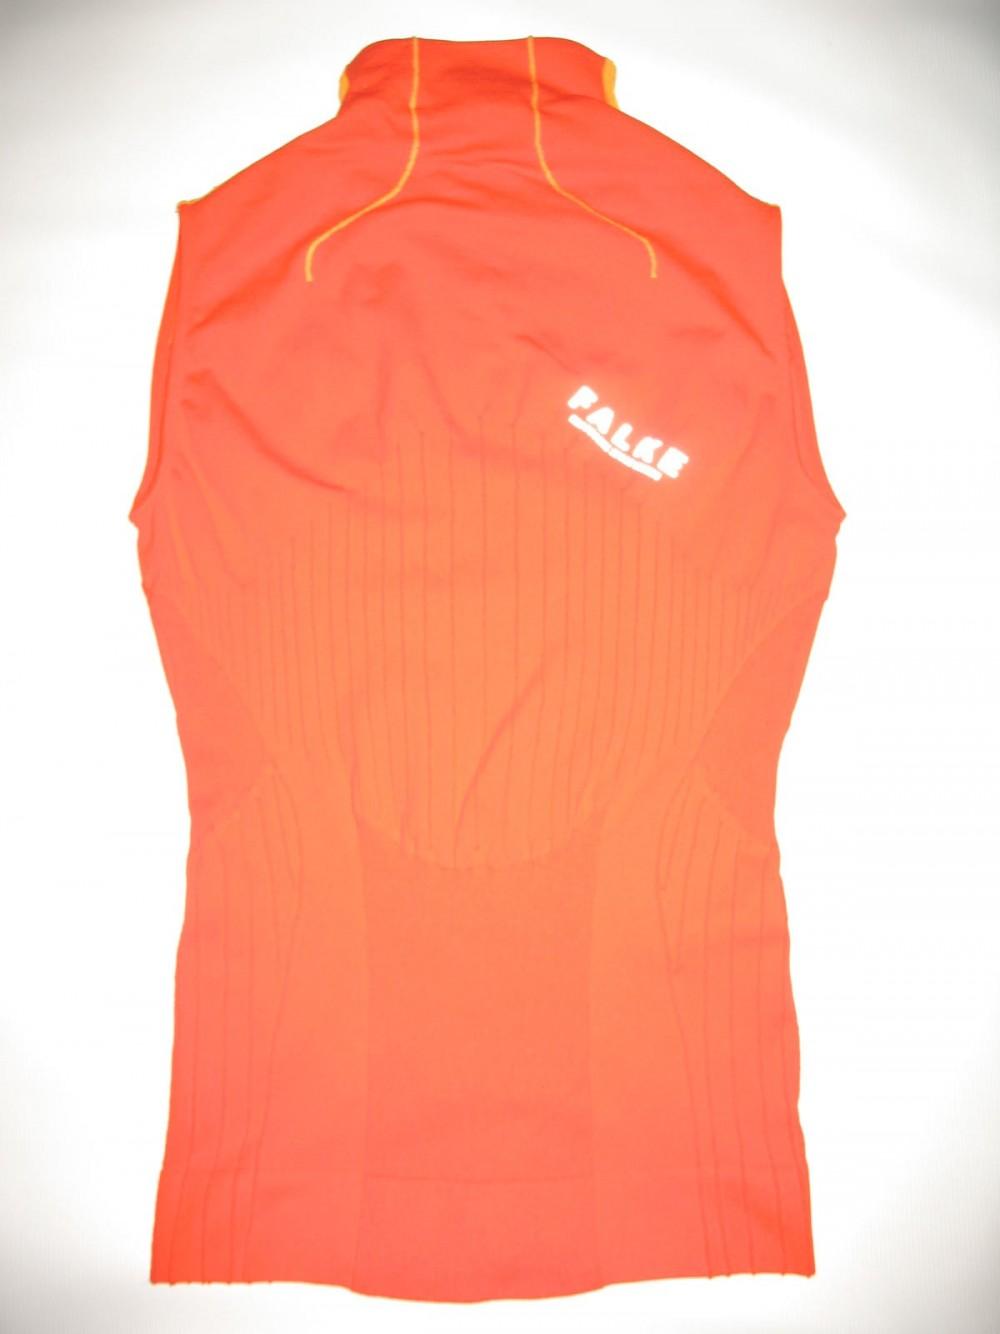 Футболка FALKE compress jersey lady (размер S) - 1